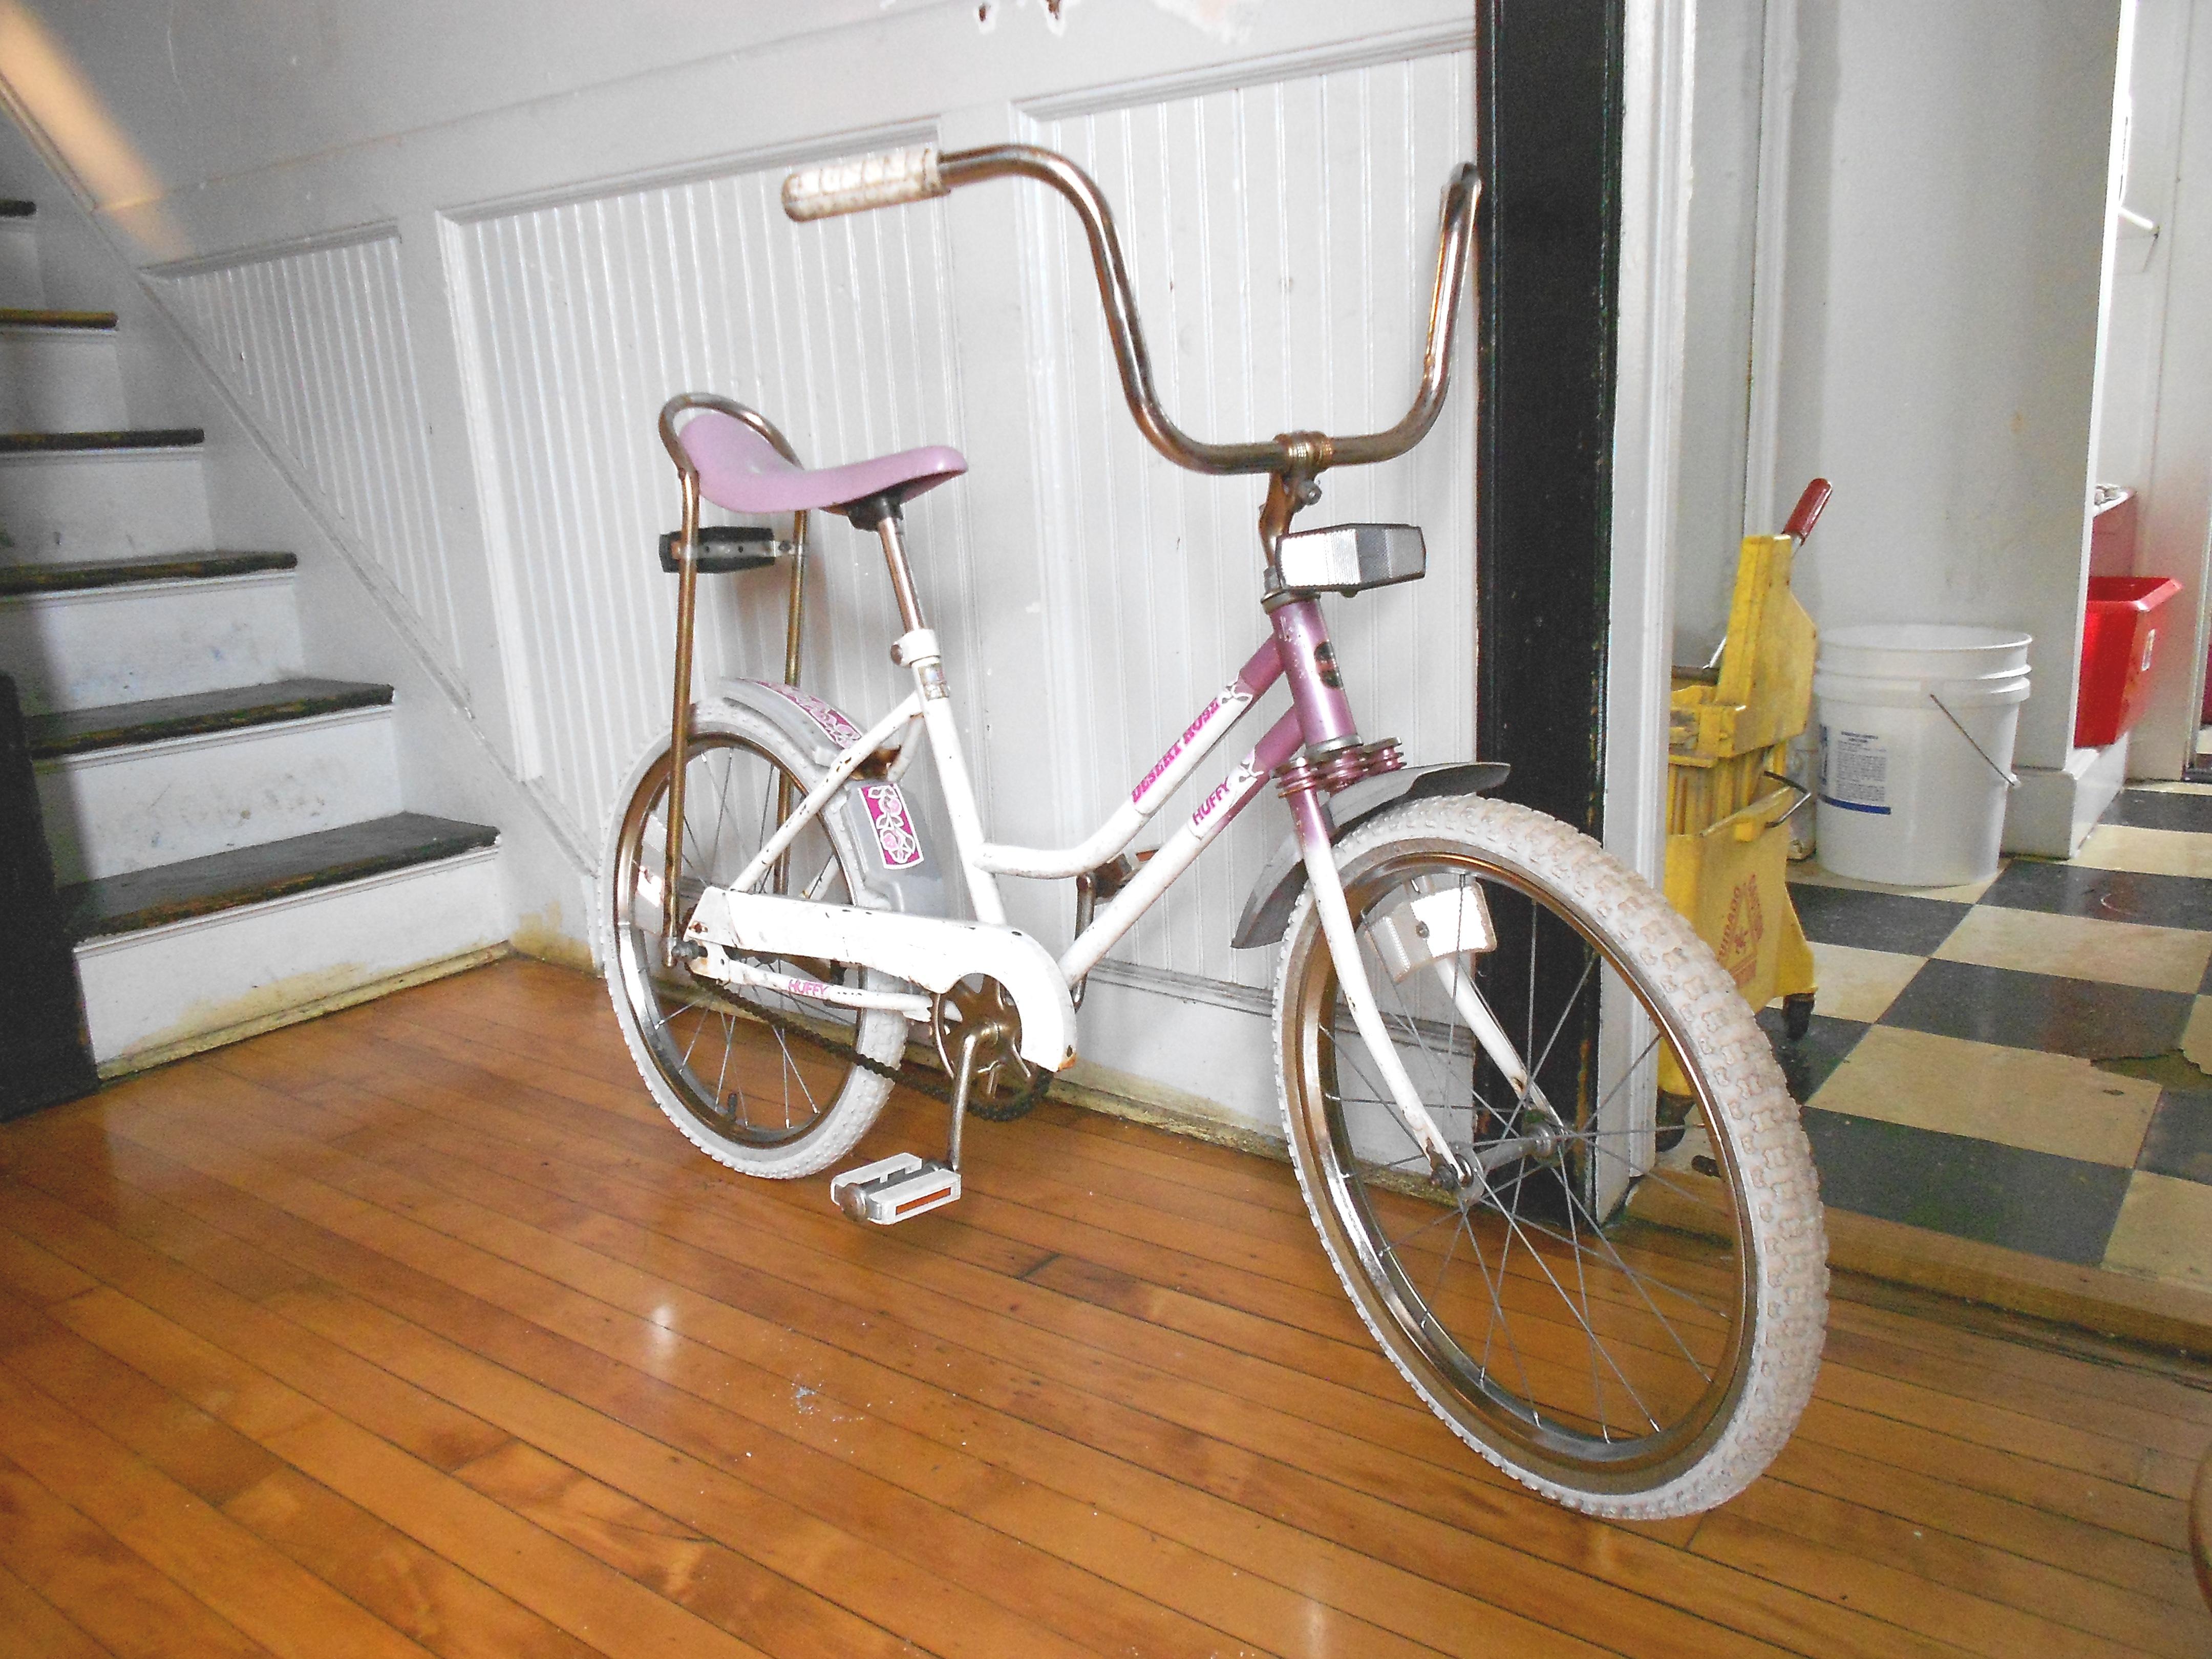 used adult bicycles jpg 1200x900